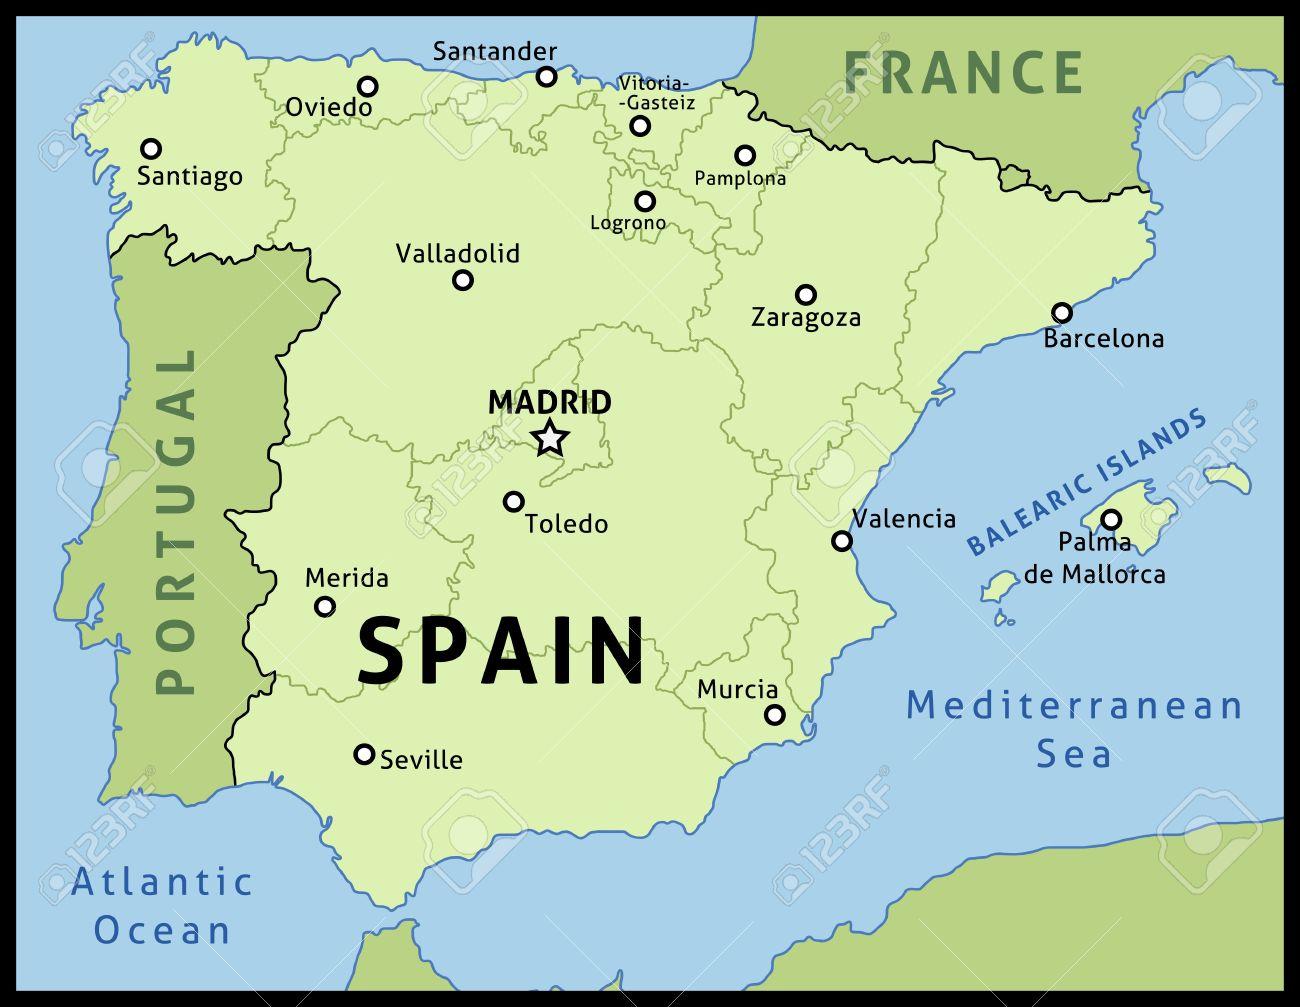 Mapa De Espana Esquema Ilustracion Mapa Del Pais Con Las